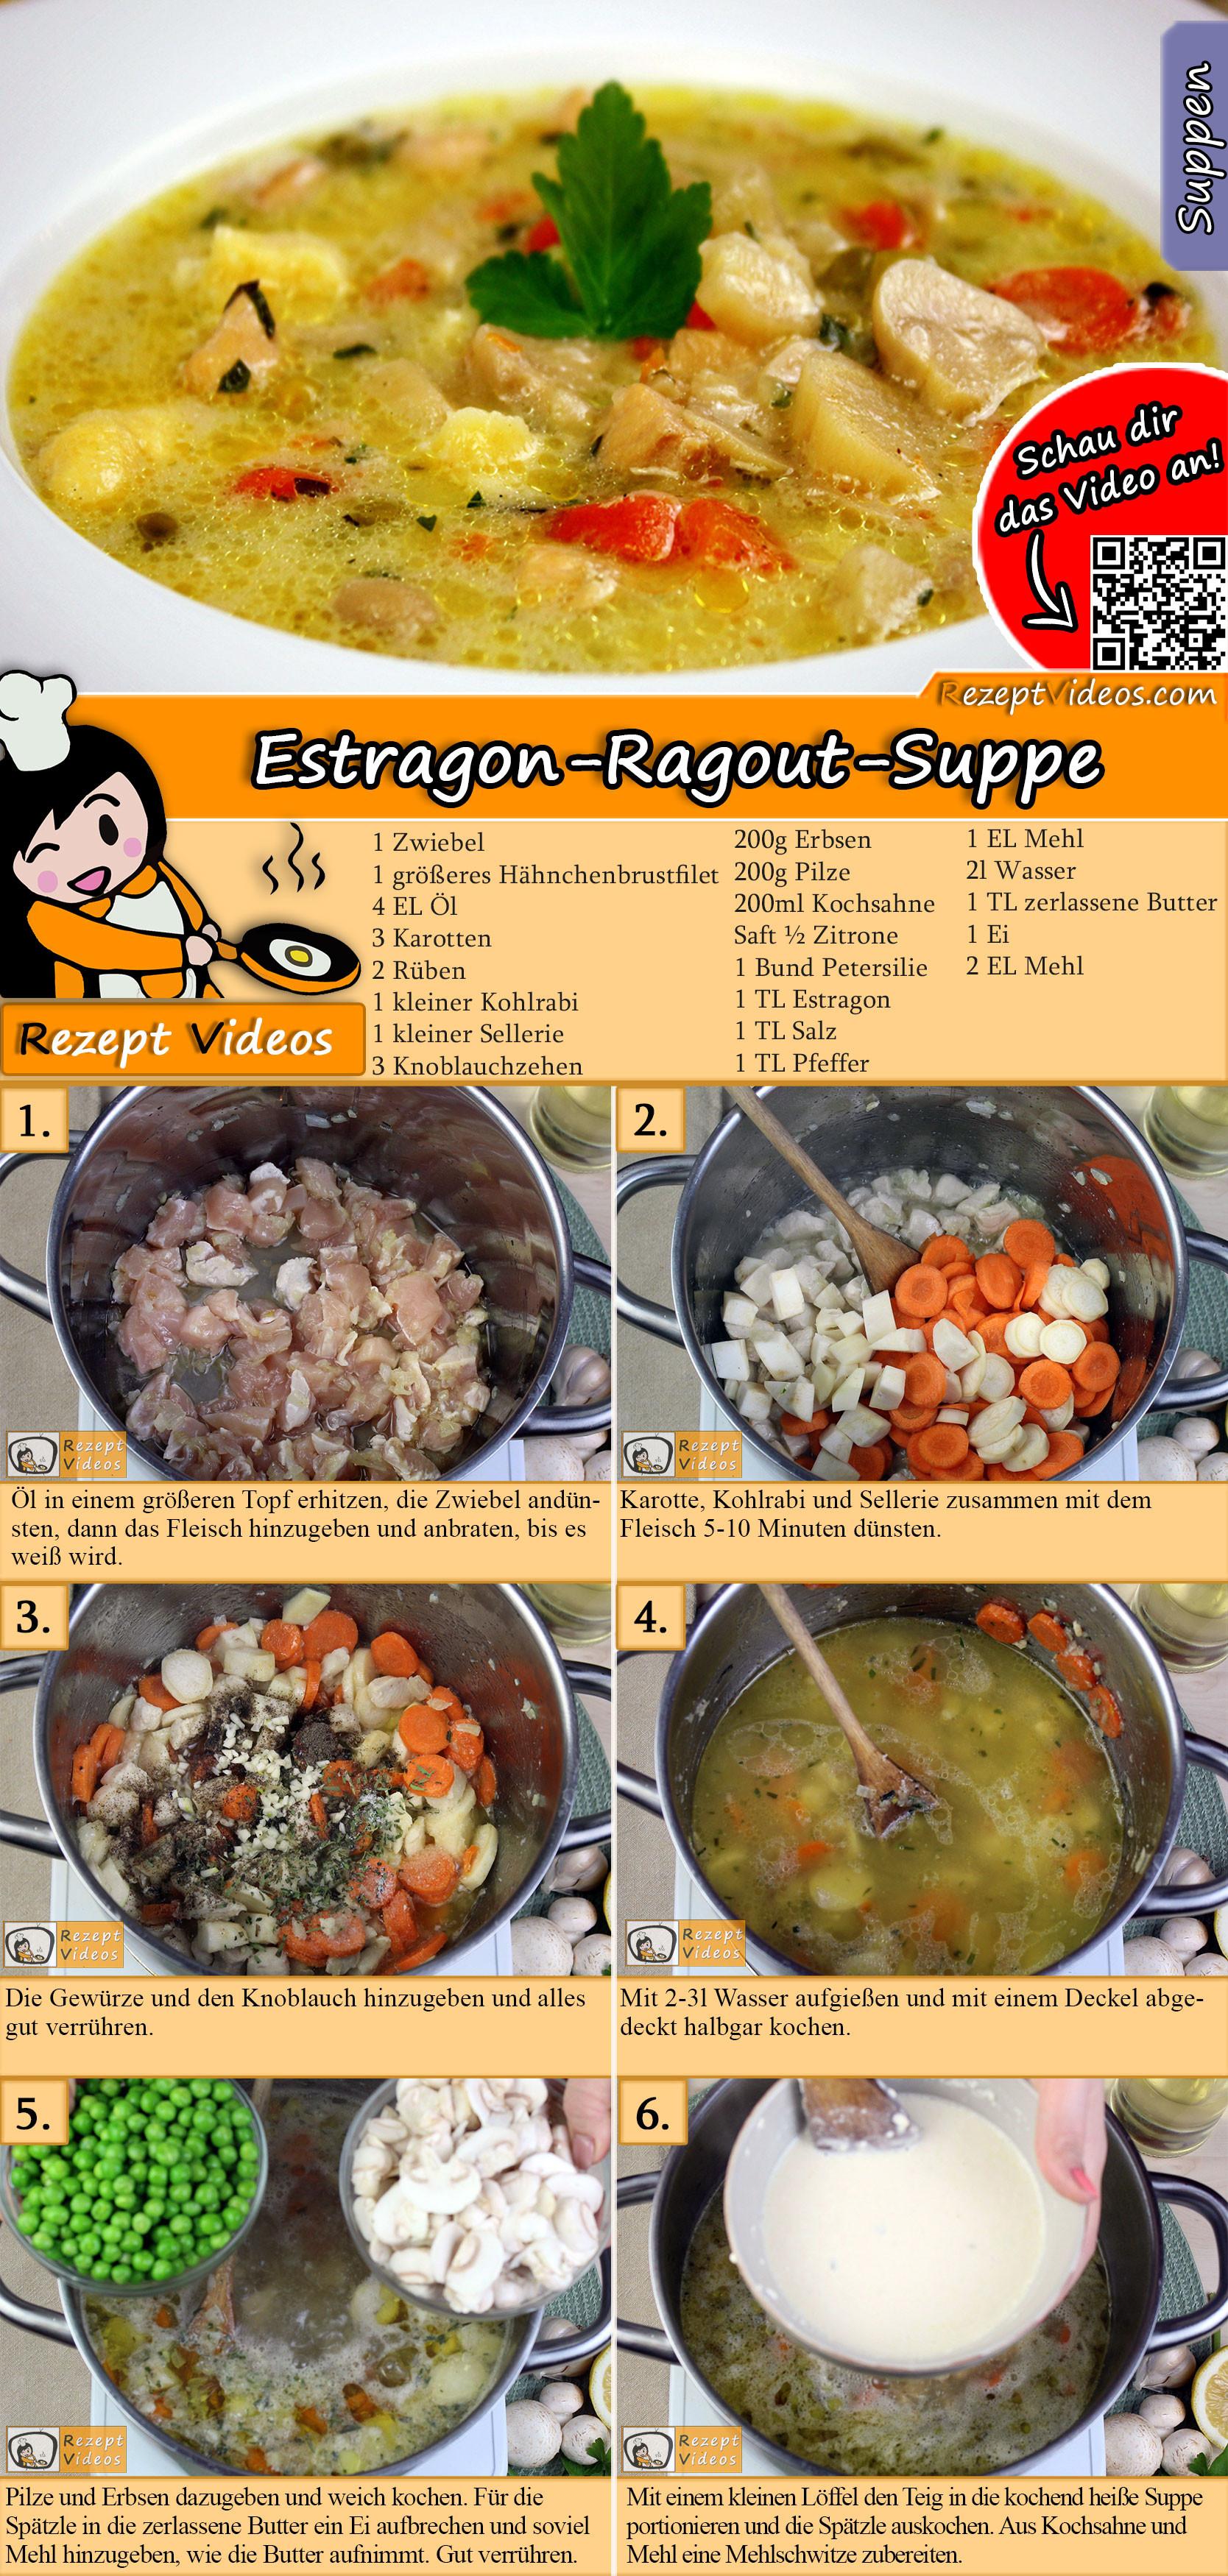 Estragon-Ragout-Suppe Rezept mit Video